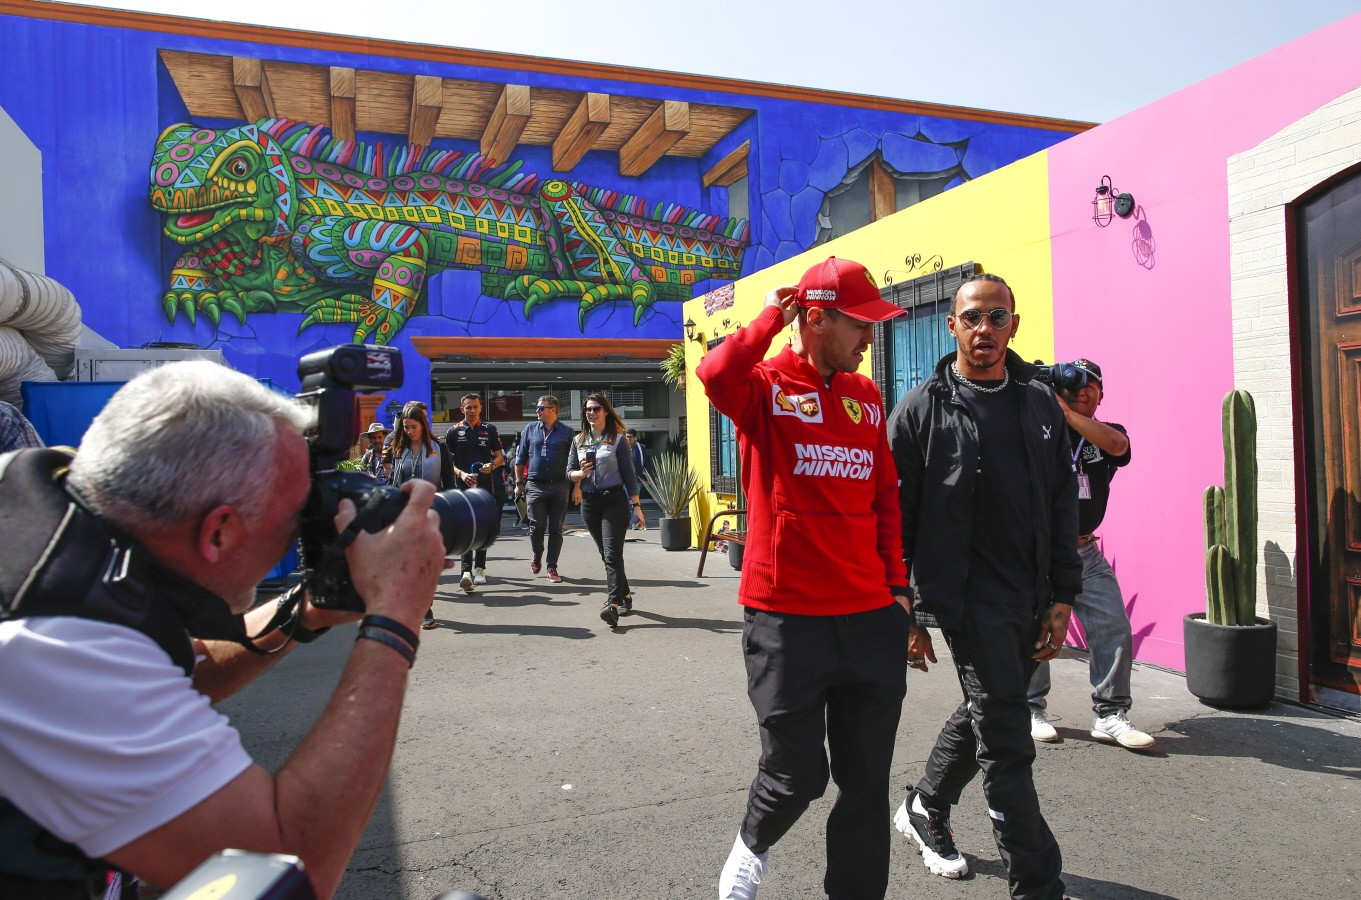 Motorsports: FIA Formula One World Championship, WM, Weltmeisterschaft 2019, Grand Prix of Mexico, 5 Sebastian Vettel (G